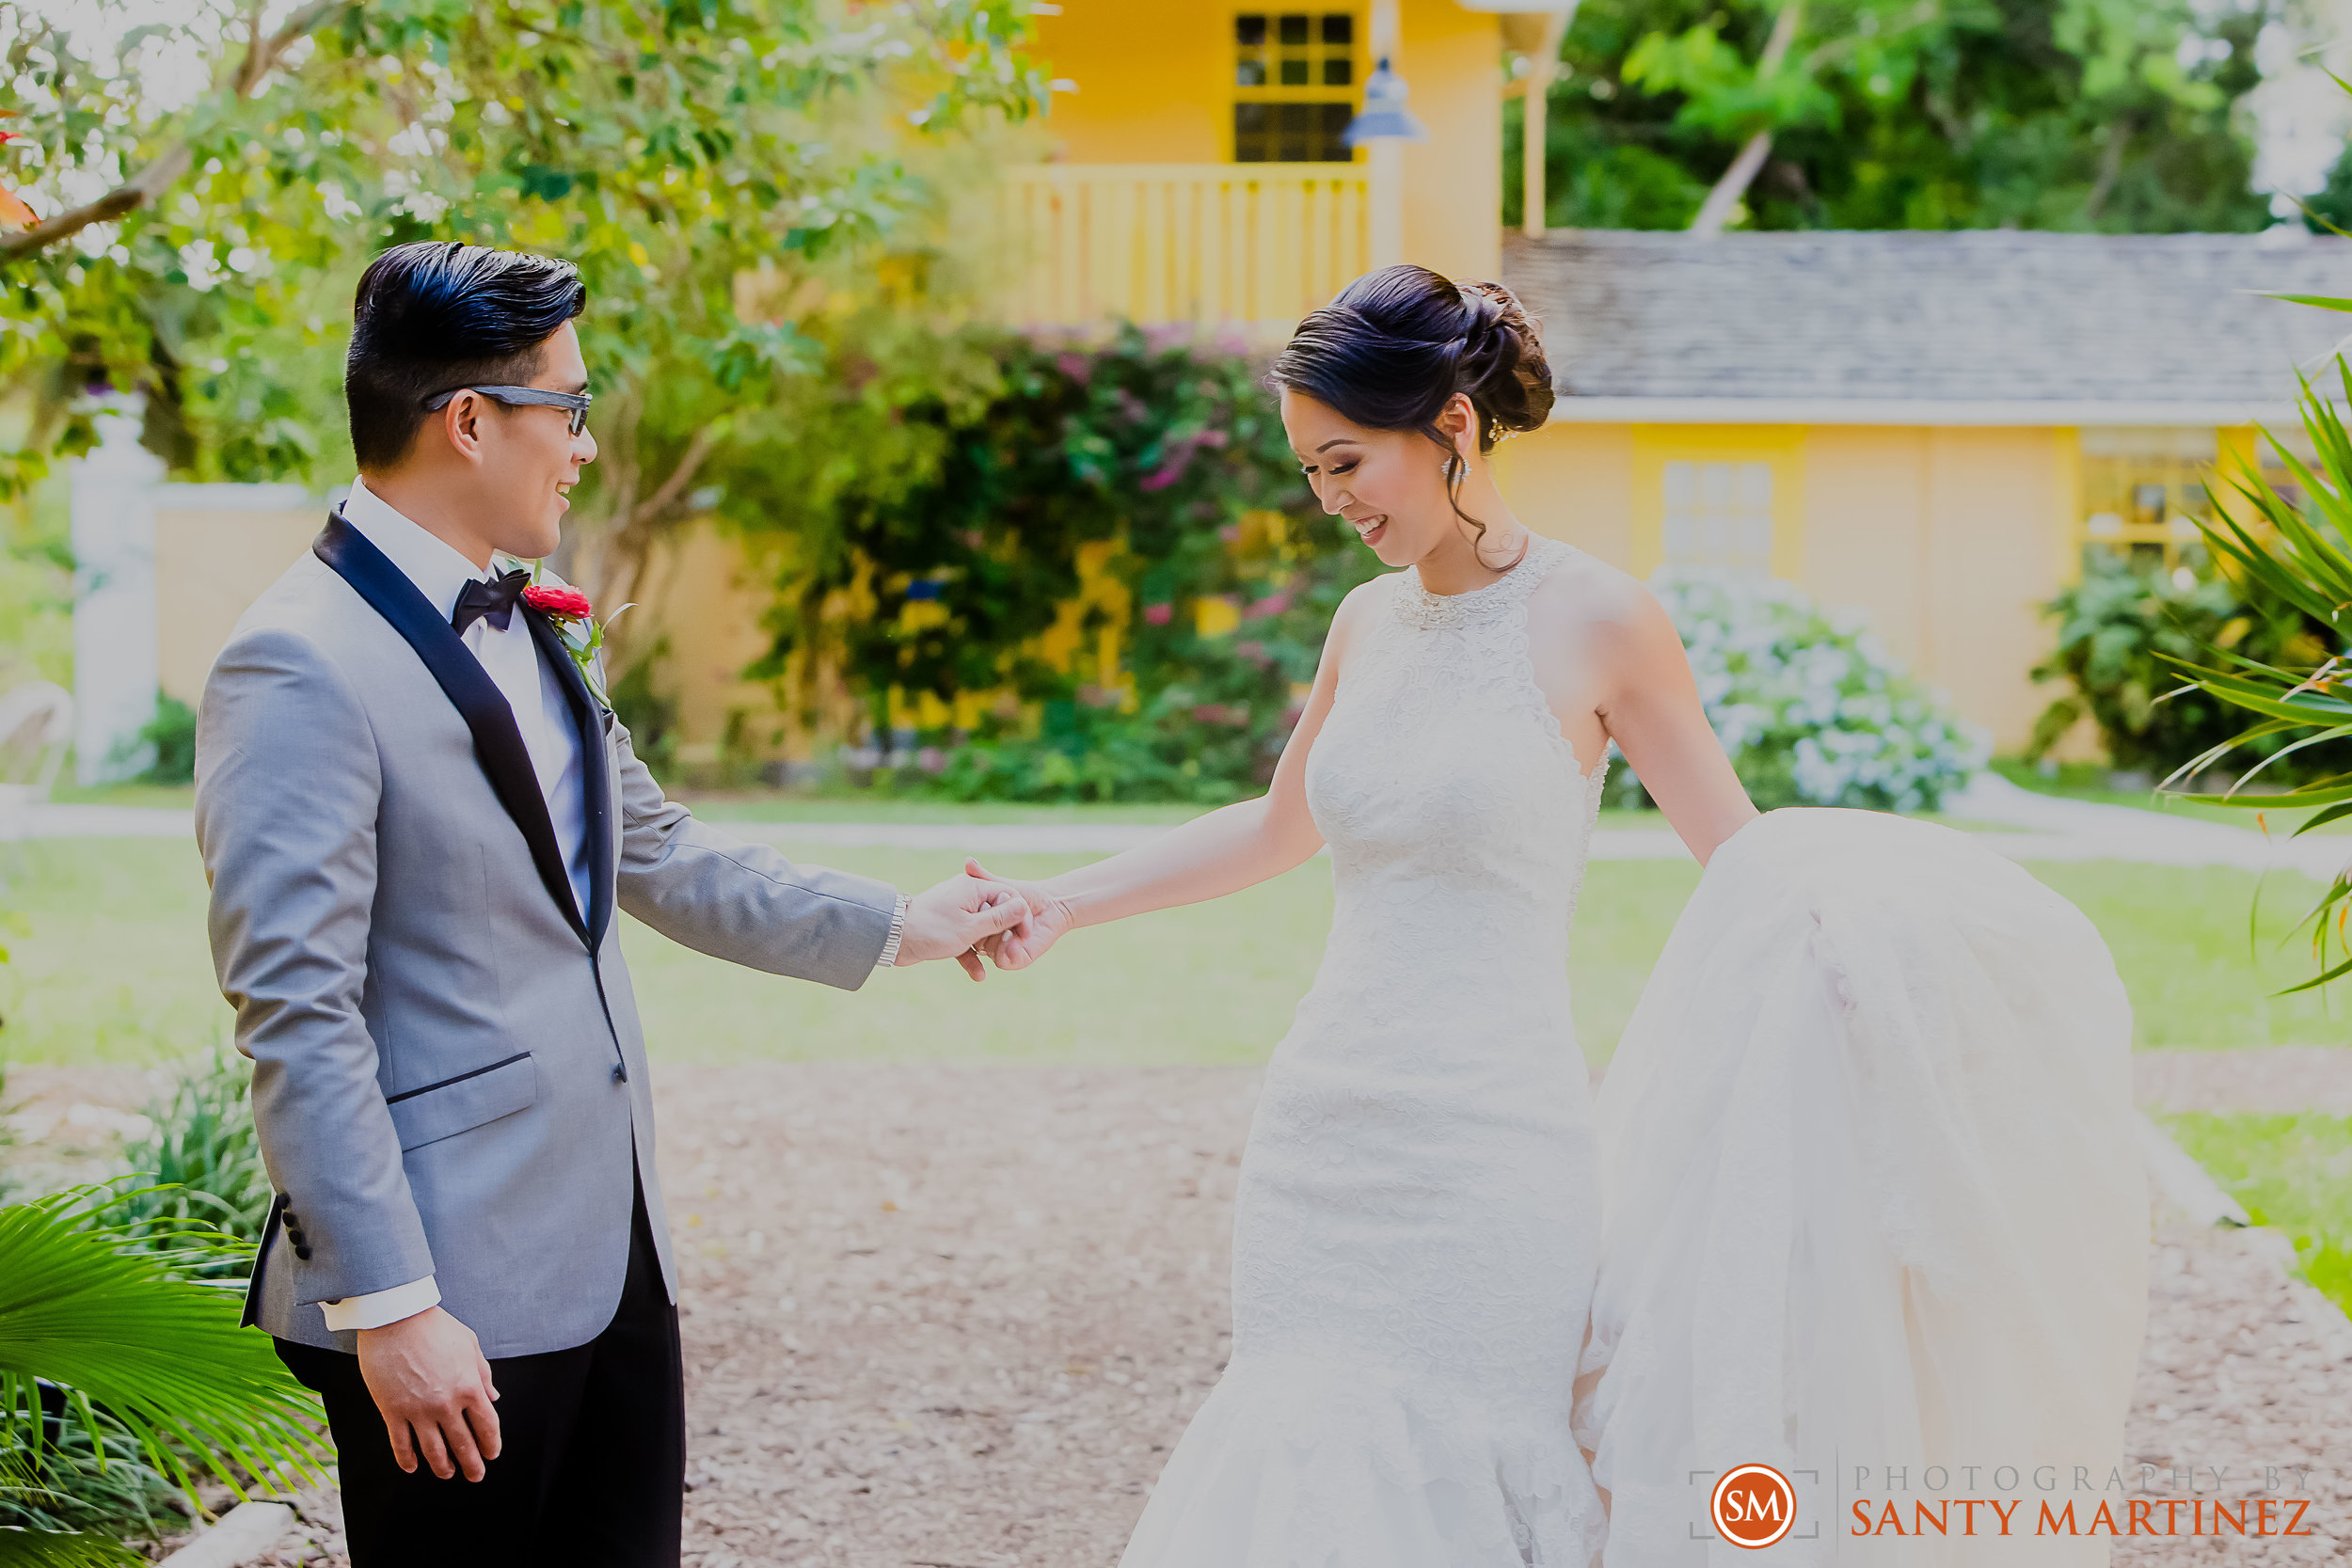 Wedding Bonnet House - Photography by Santy Martinez-12.jpg